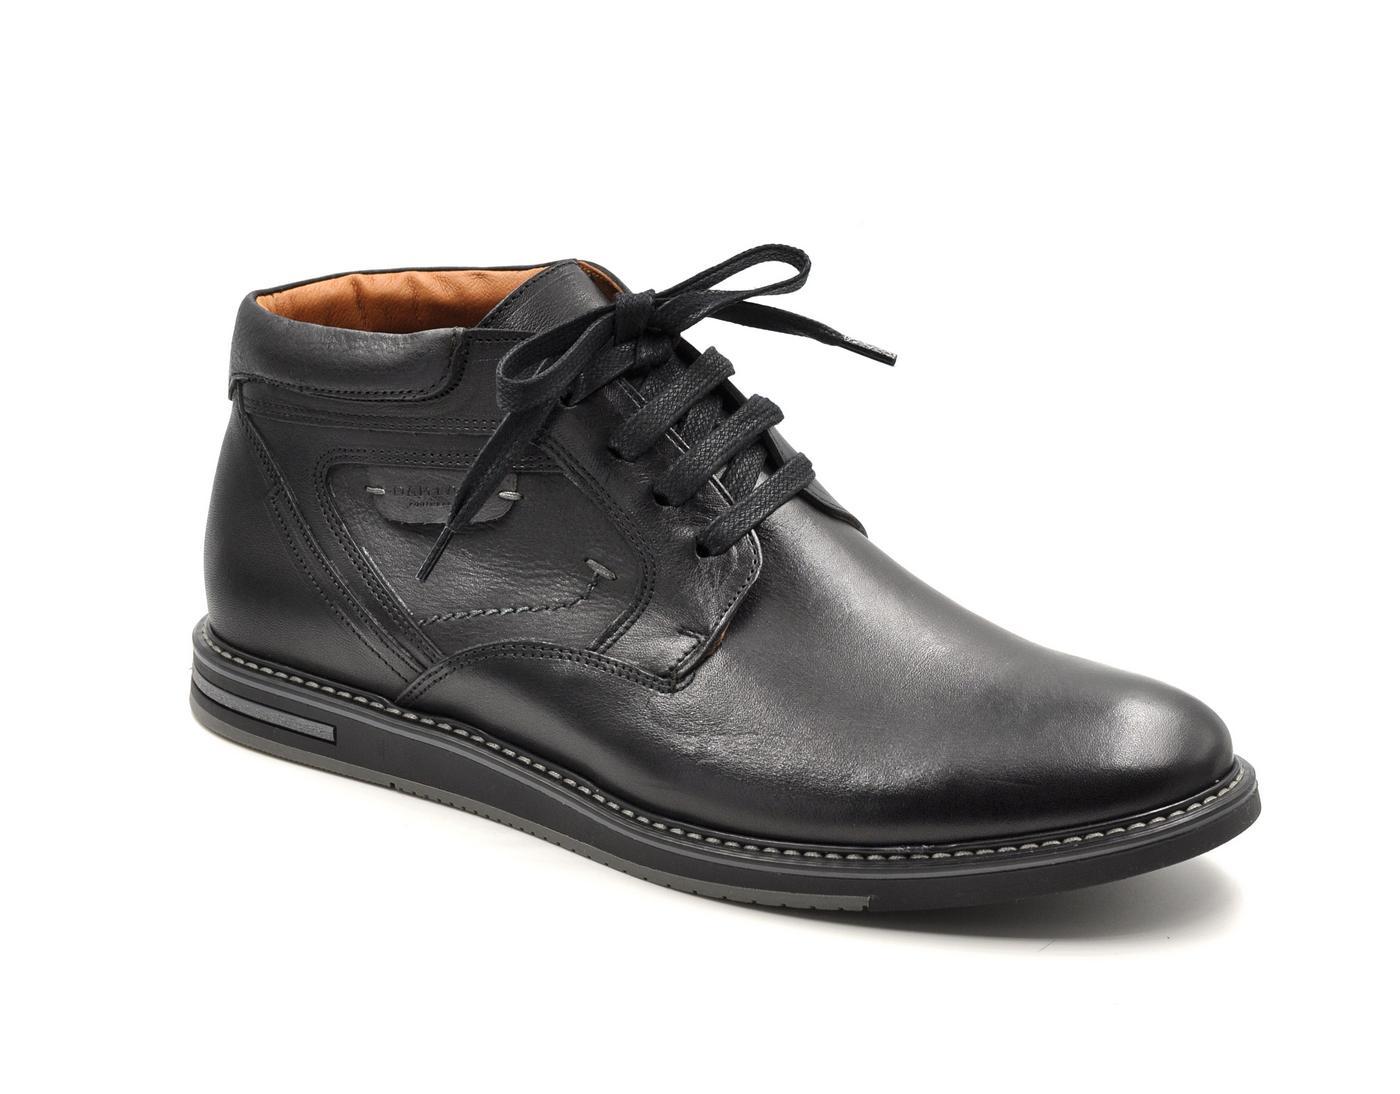 757eac6461c Ανδρικό μποτάκι μαύρο 561 - tatogloushoes.gr